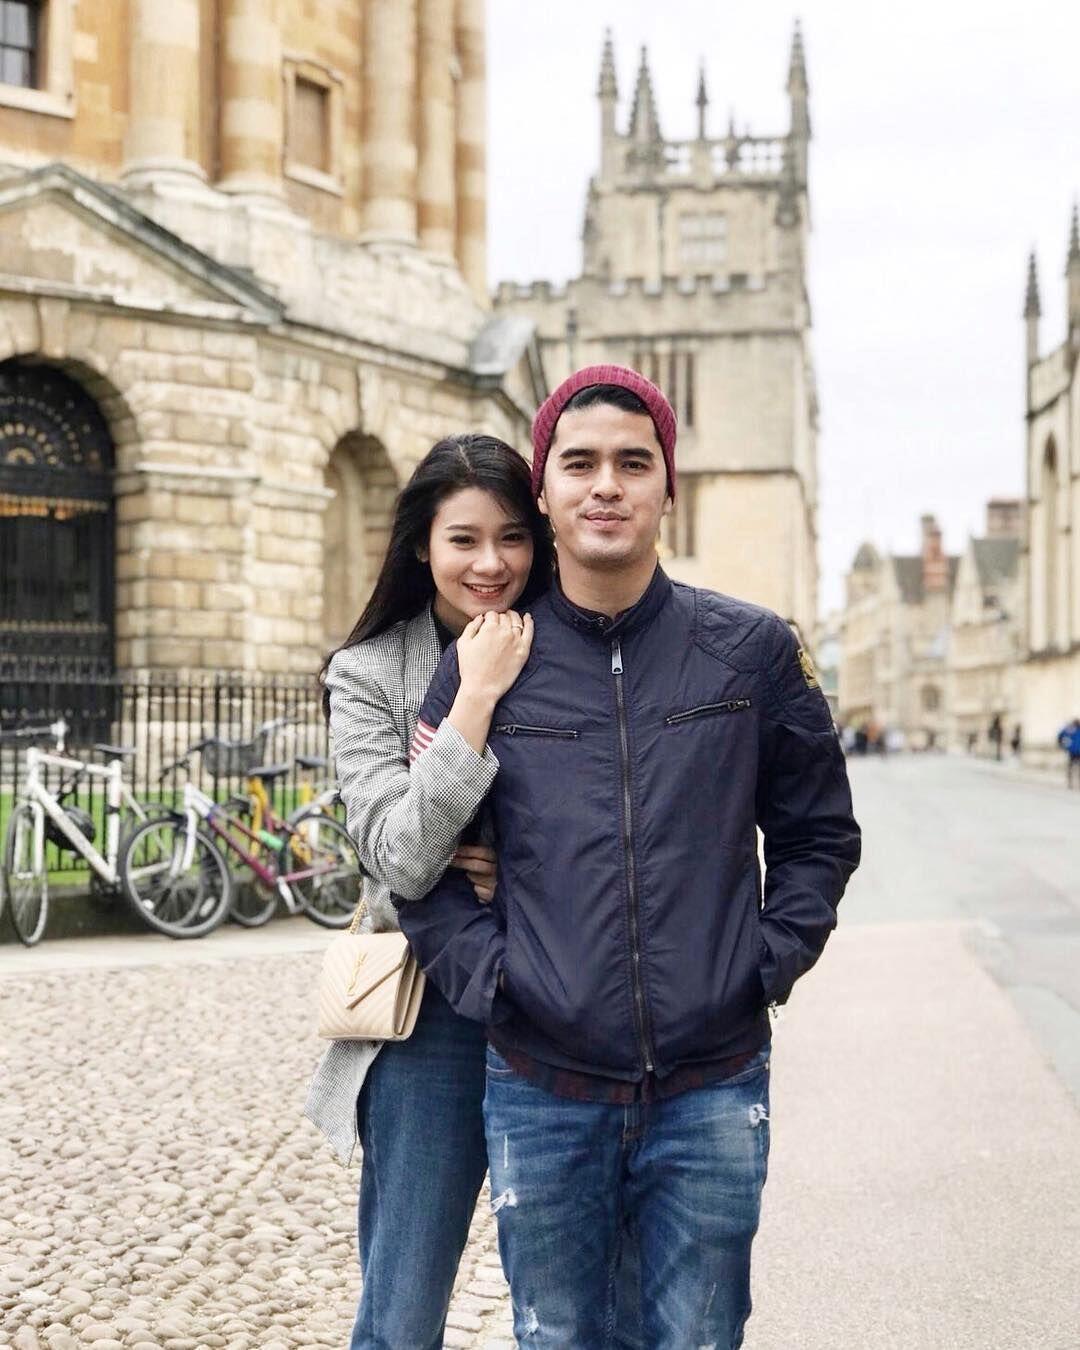 Sedang Hamil, Ini 10 Potret Amanda Zevannya dan Suami yang Bikin Baper